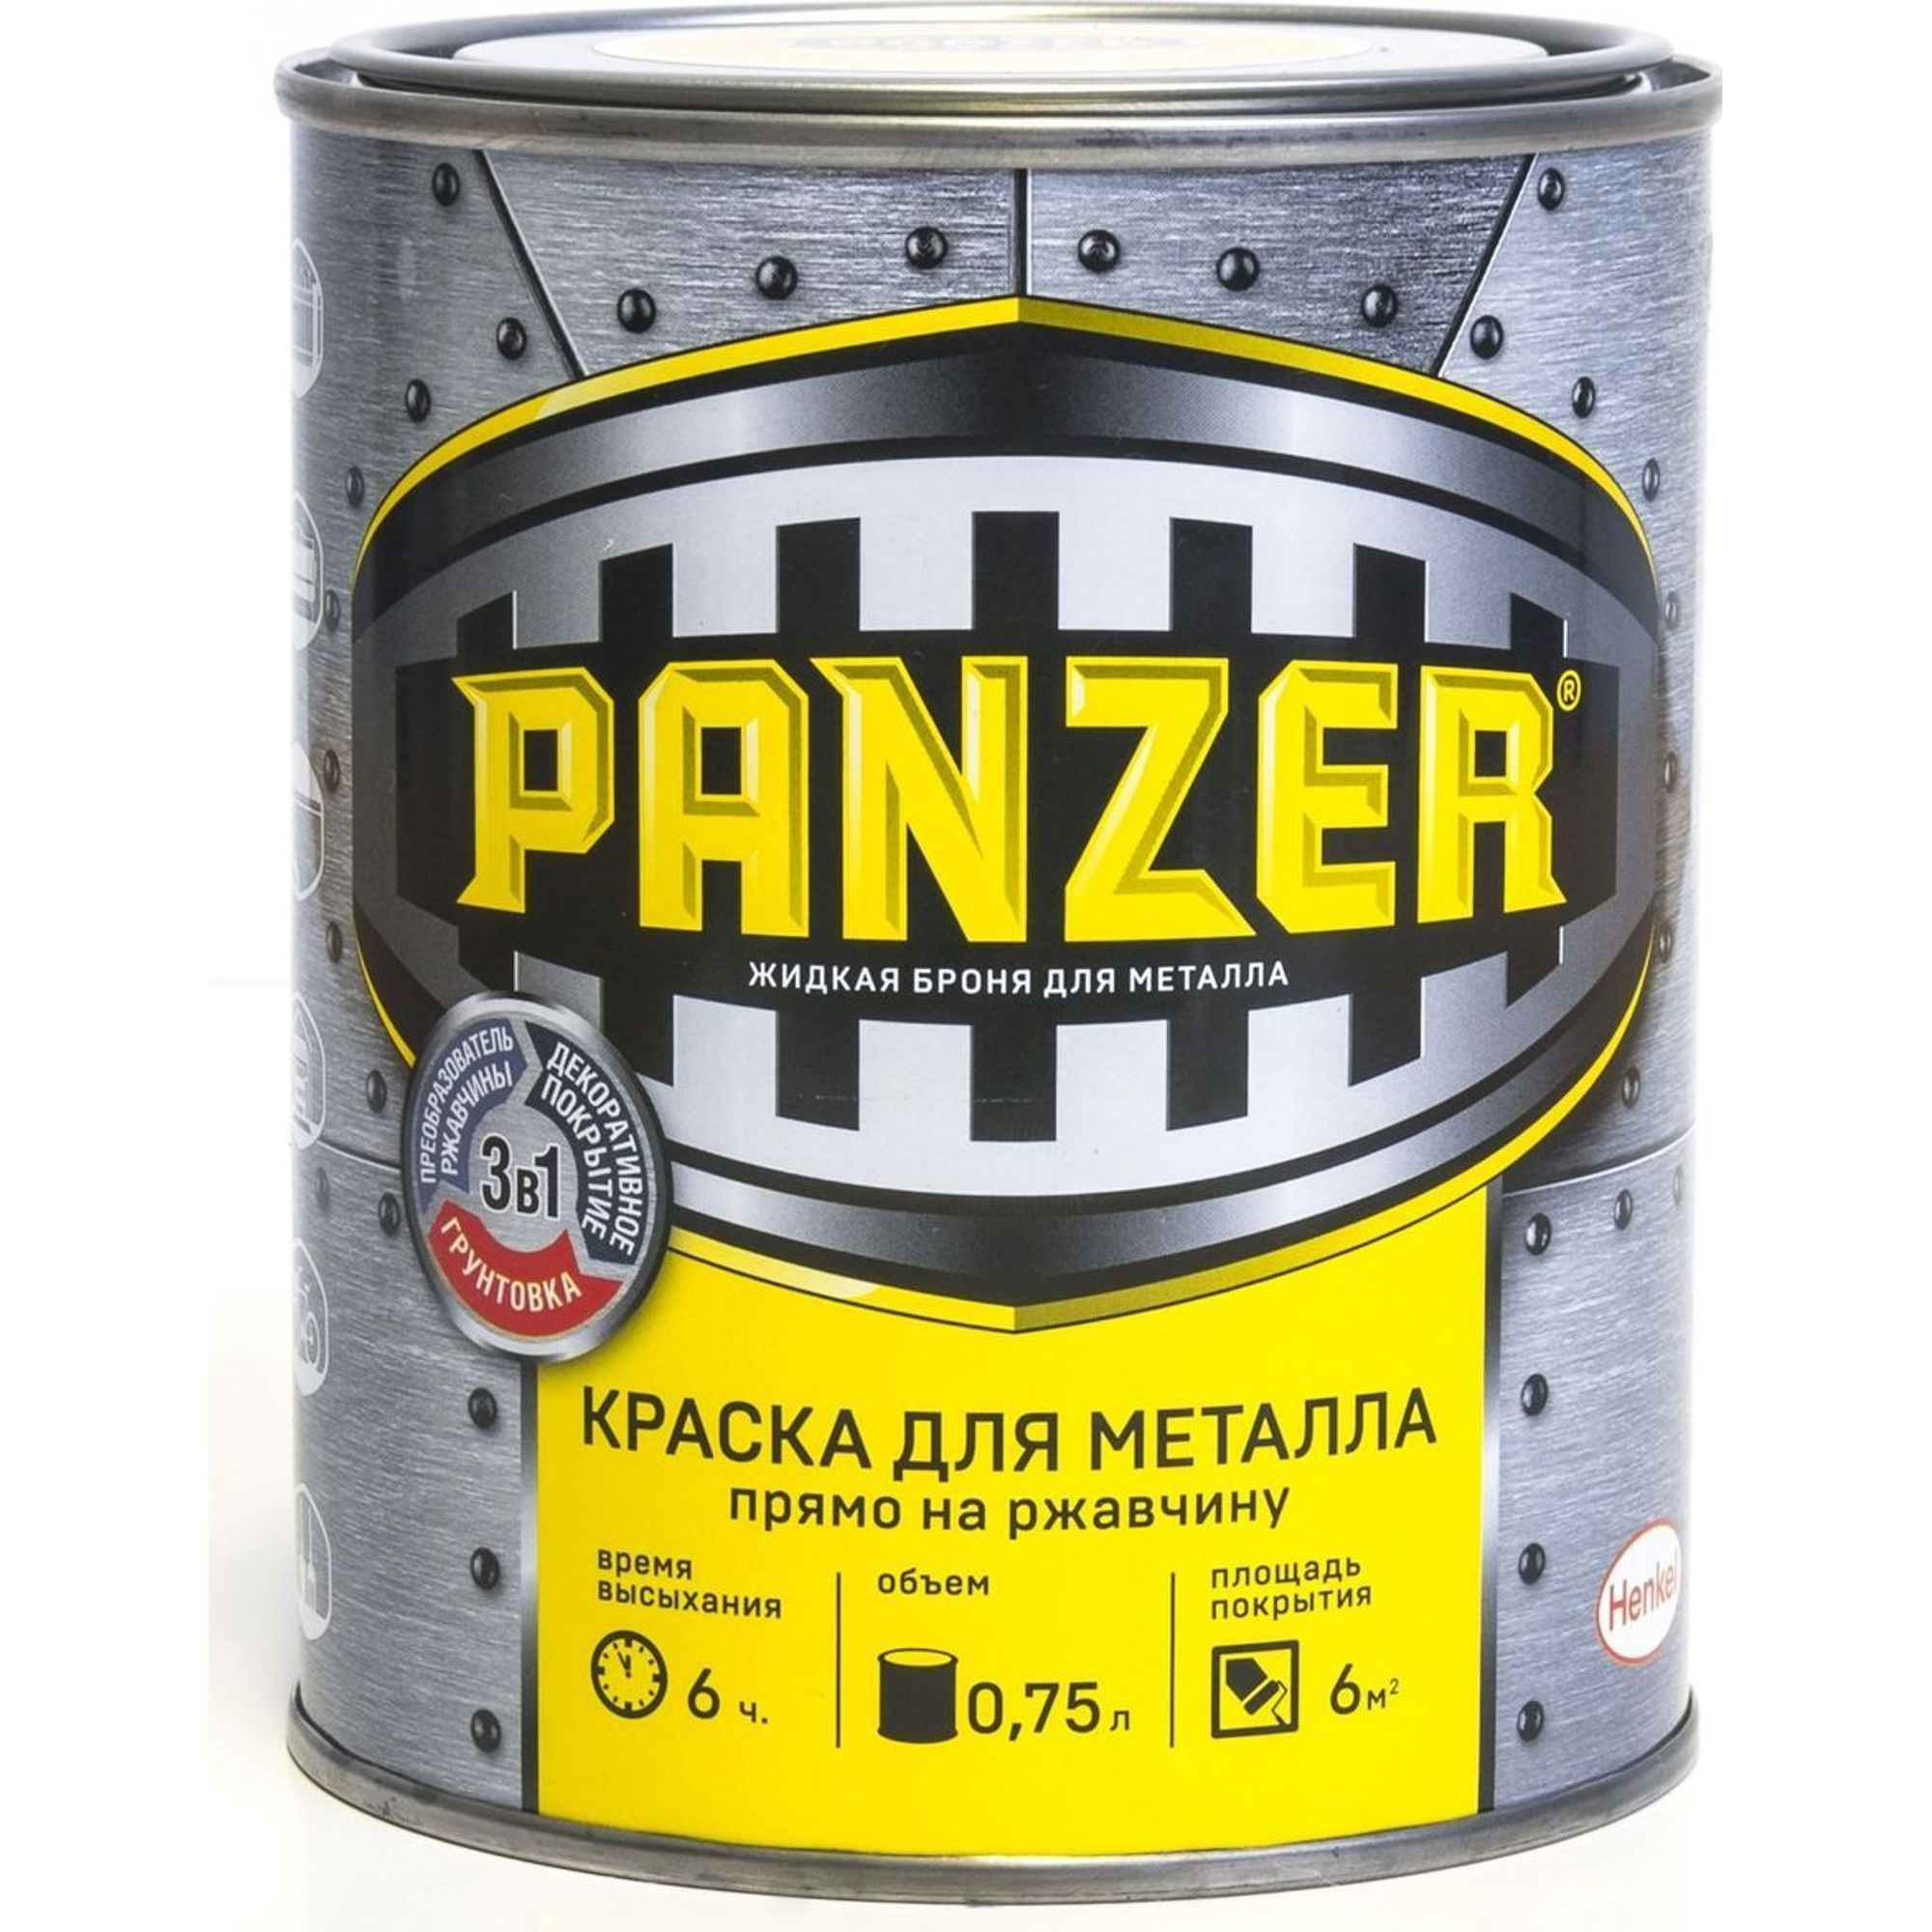 Краска для металла Panzer гладкая желтая 0.75 л недорого